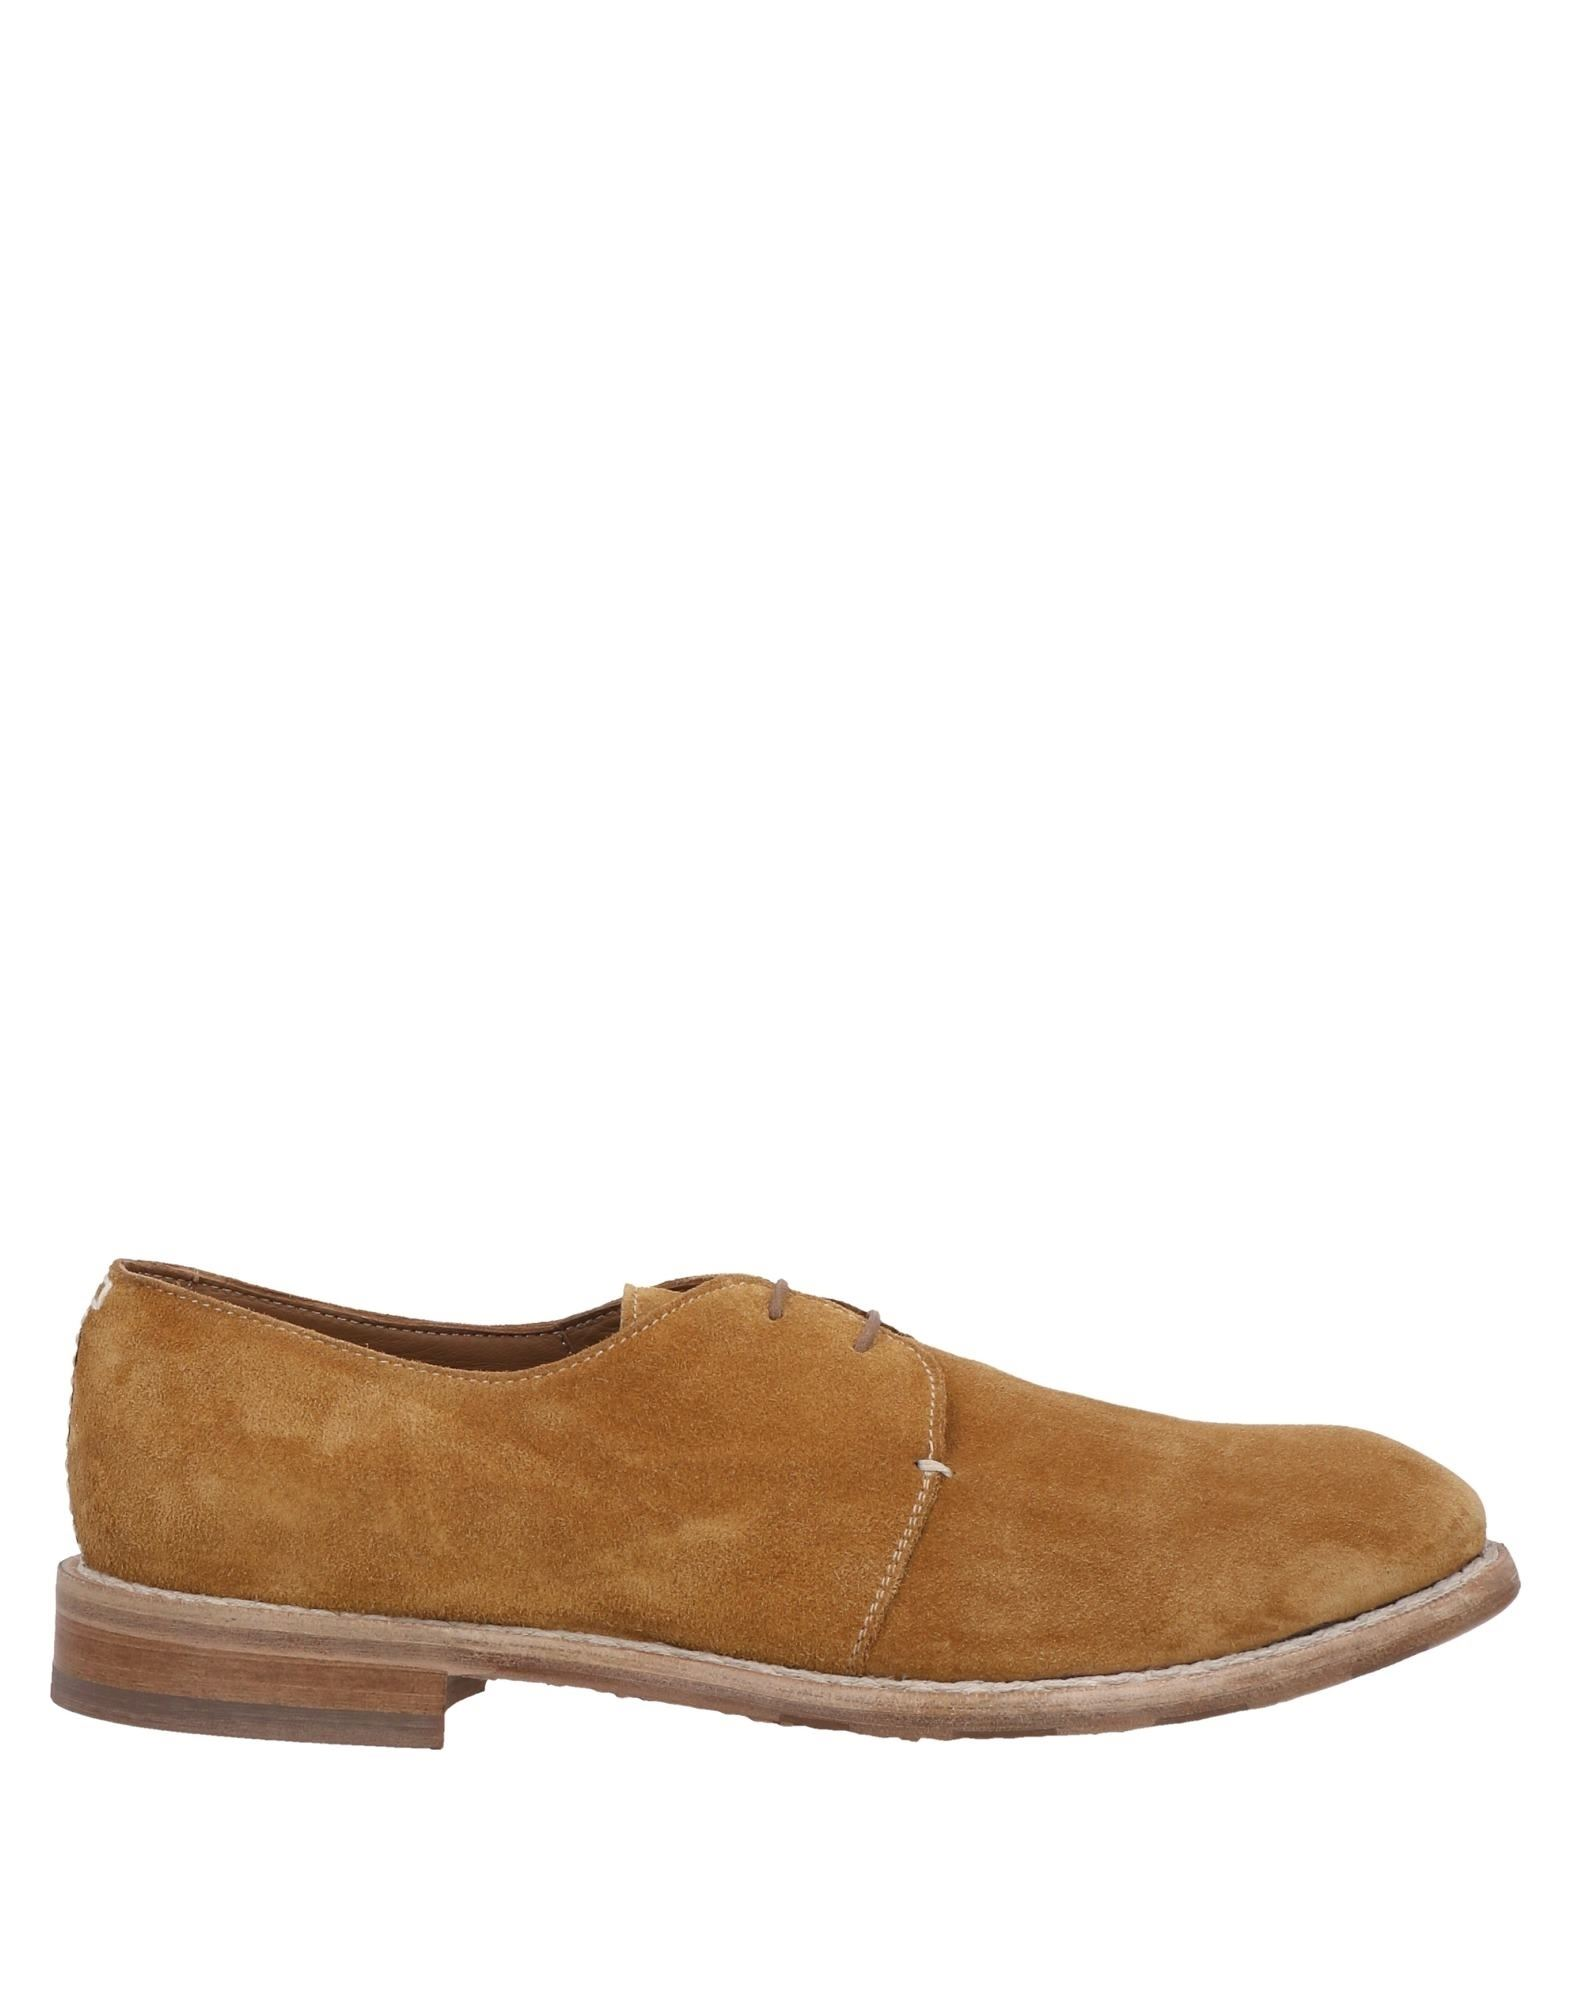 TROFEO by STEFANO BRANCHINI Обувь на шнурках trofeo by stefano branchini обувь на шнурках